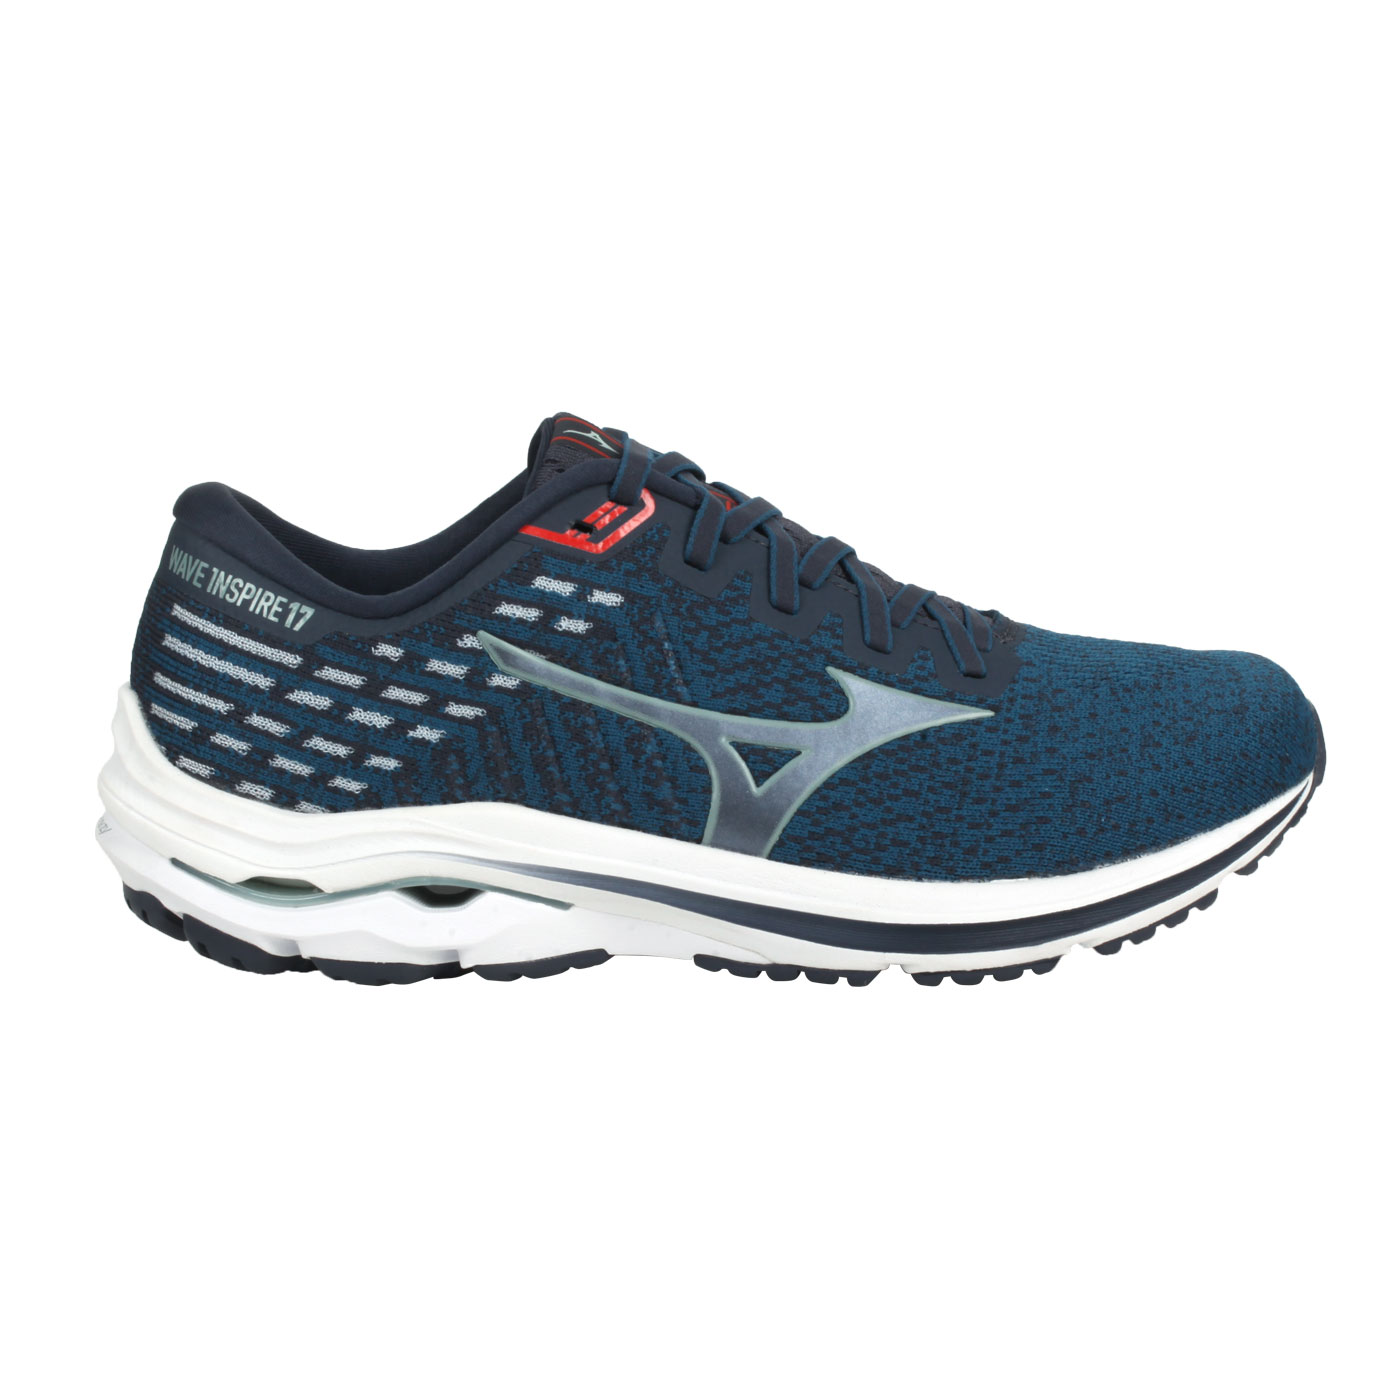 MIZUNO 男款慢跑鞋-4E  @WAVE INSPIRE 17 WAVEKNIT SW@J1GC212260